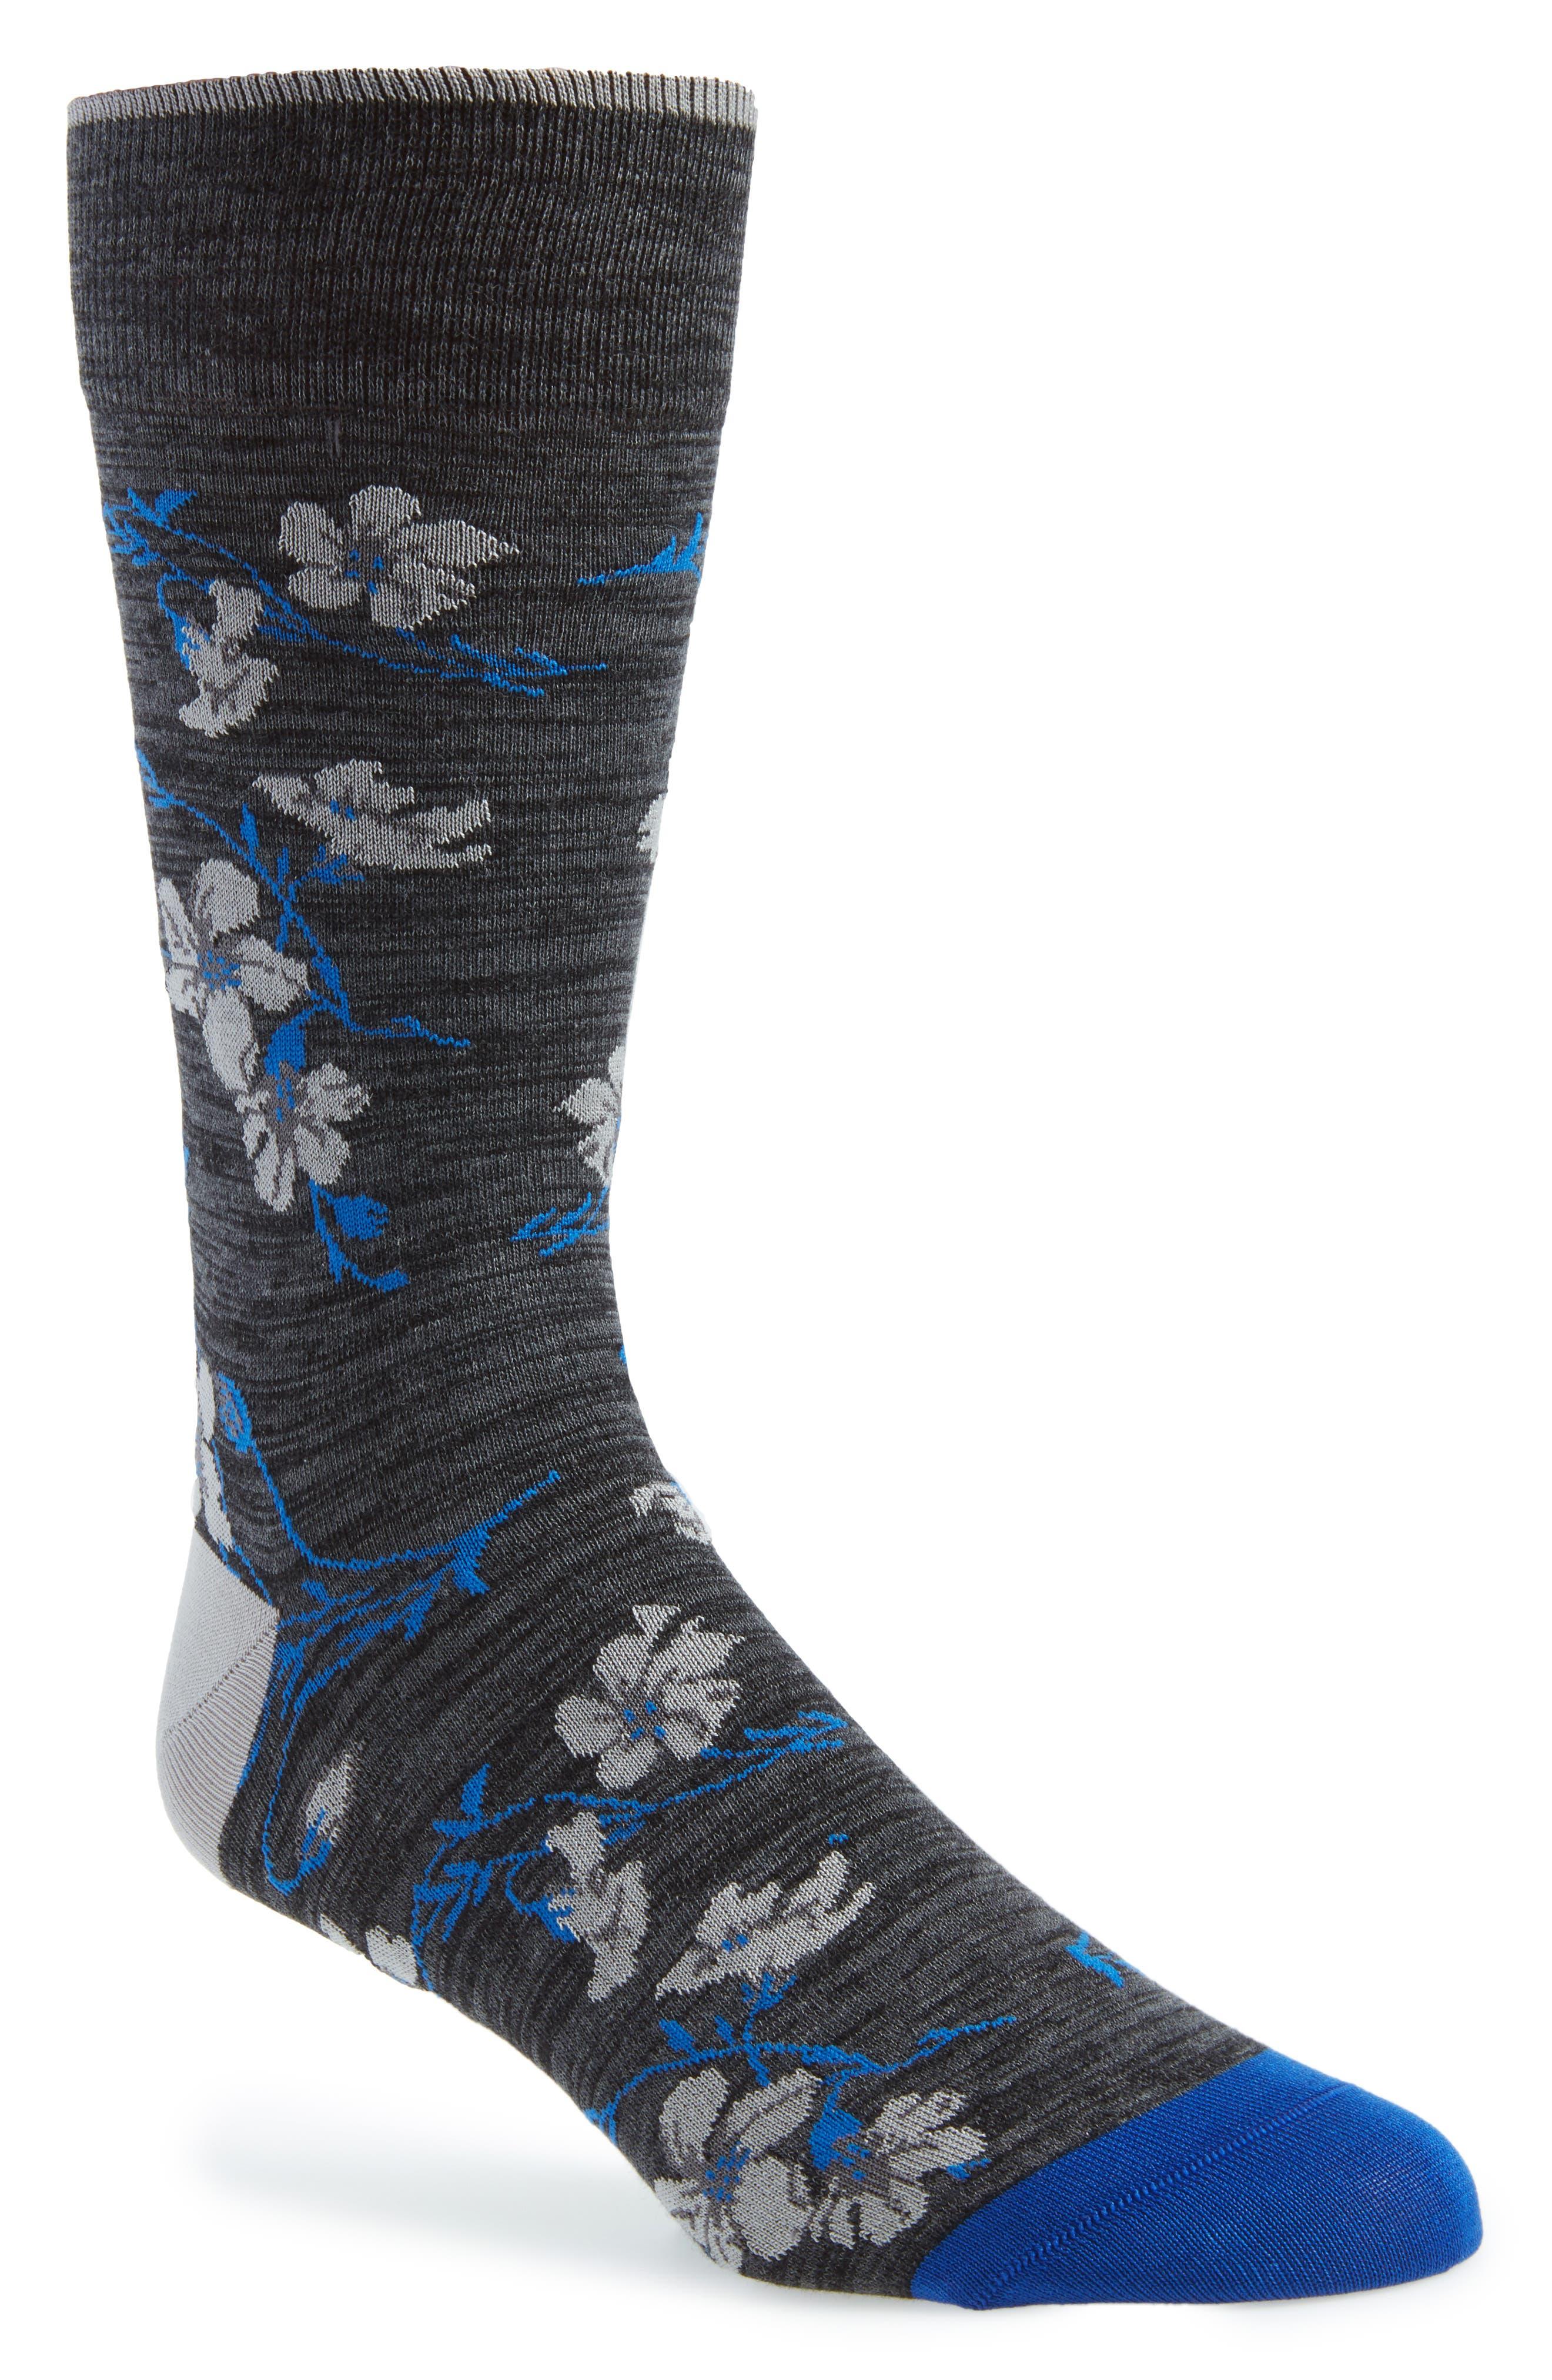 BUGATCHI Mercerized Cotton Blend Socks, Main, color, 030